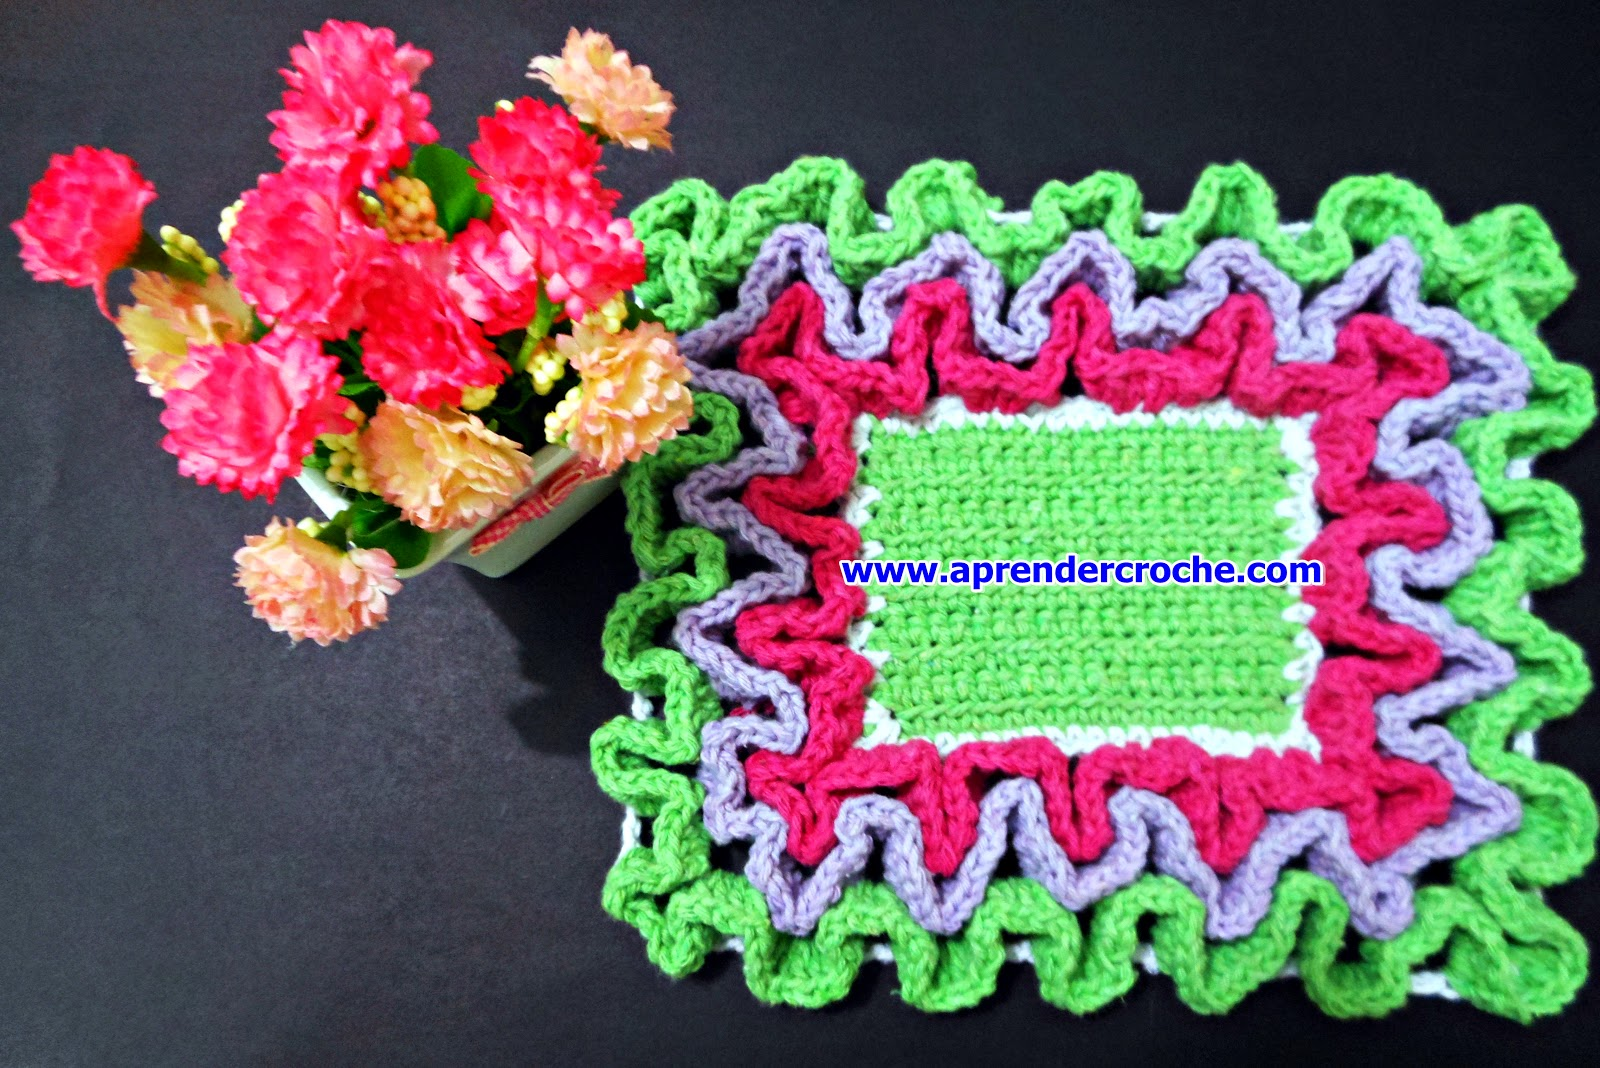 dvd barrados tapetes toalhas aprender croche video-aulas edinir-croche curso loja frete gratis